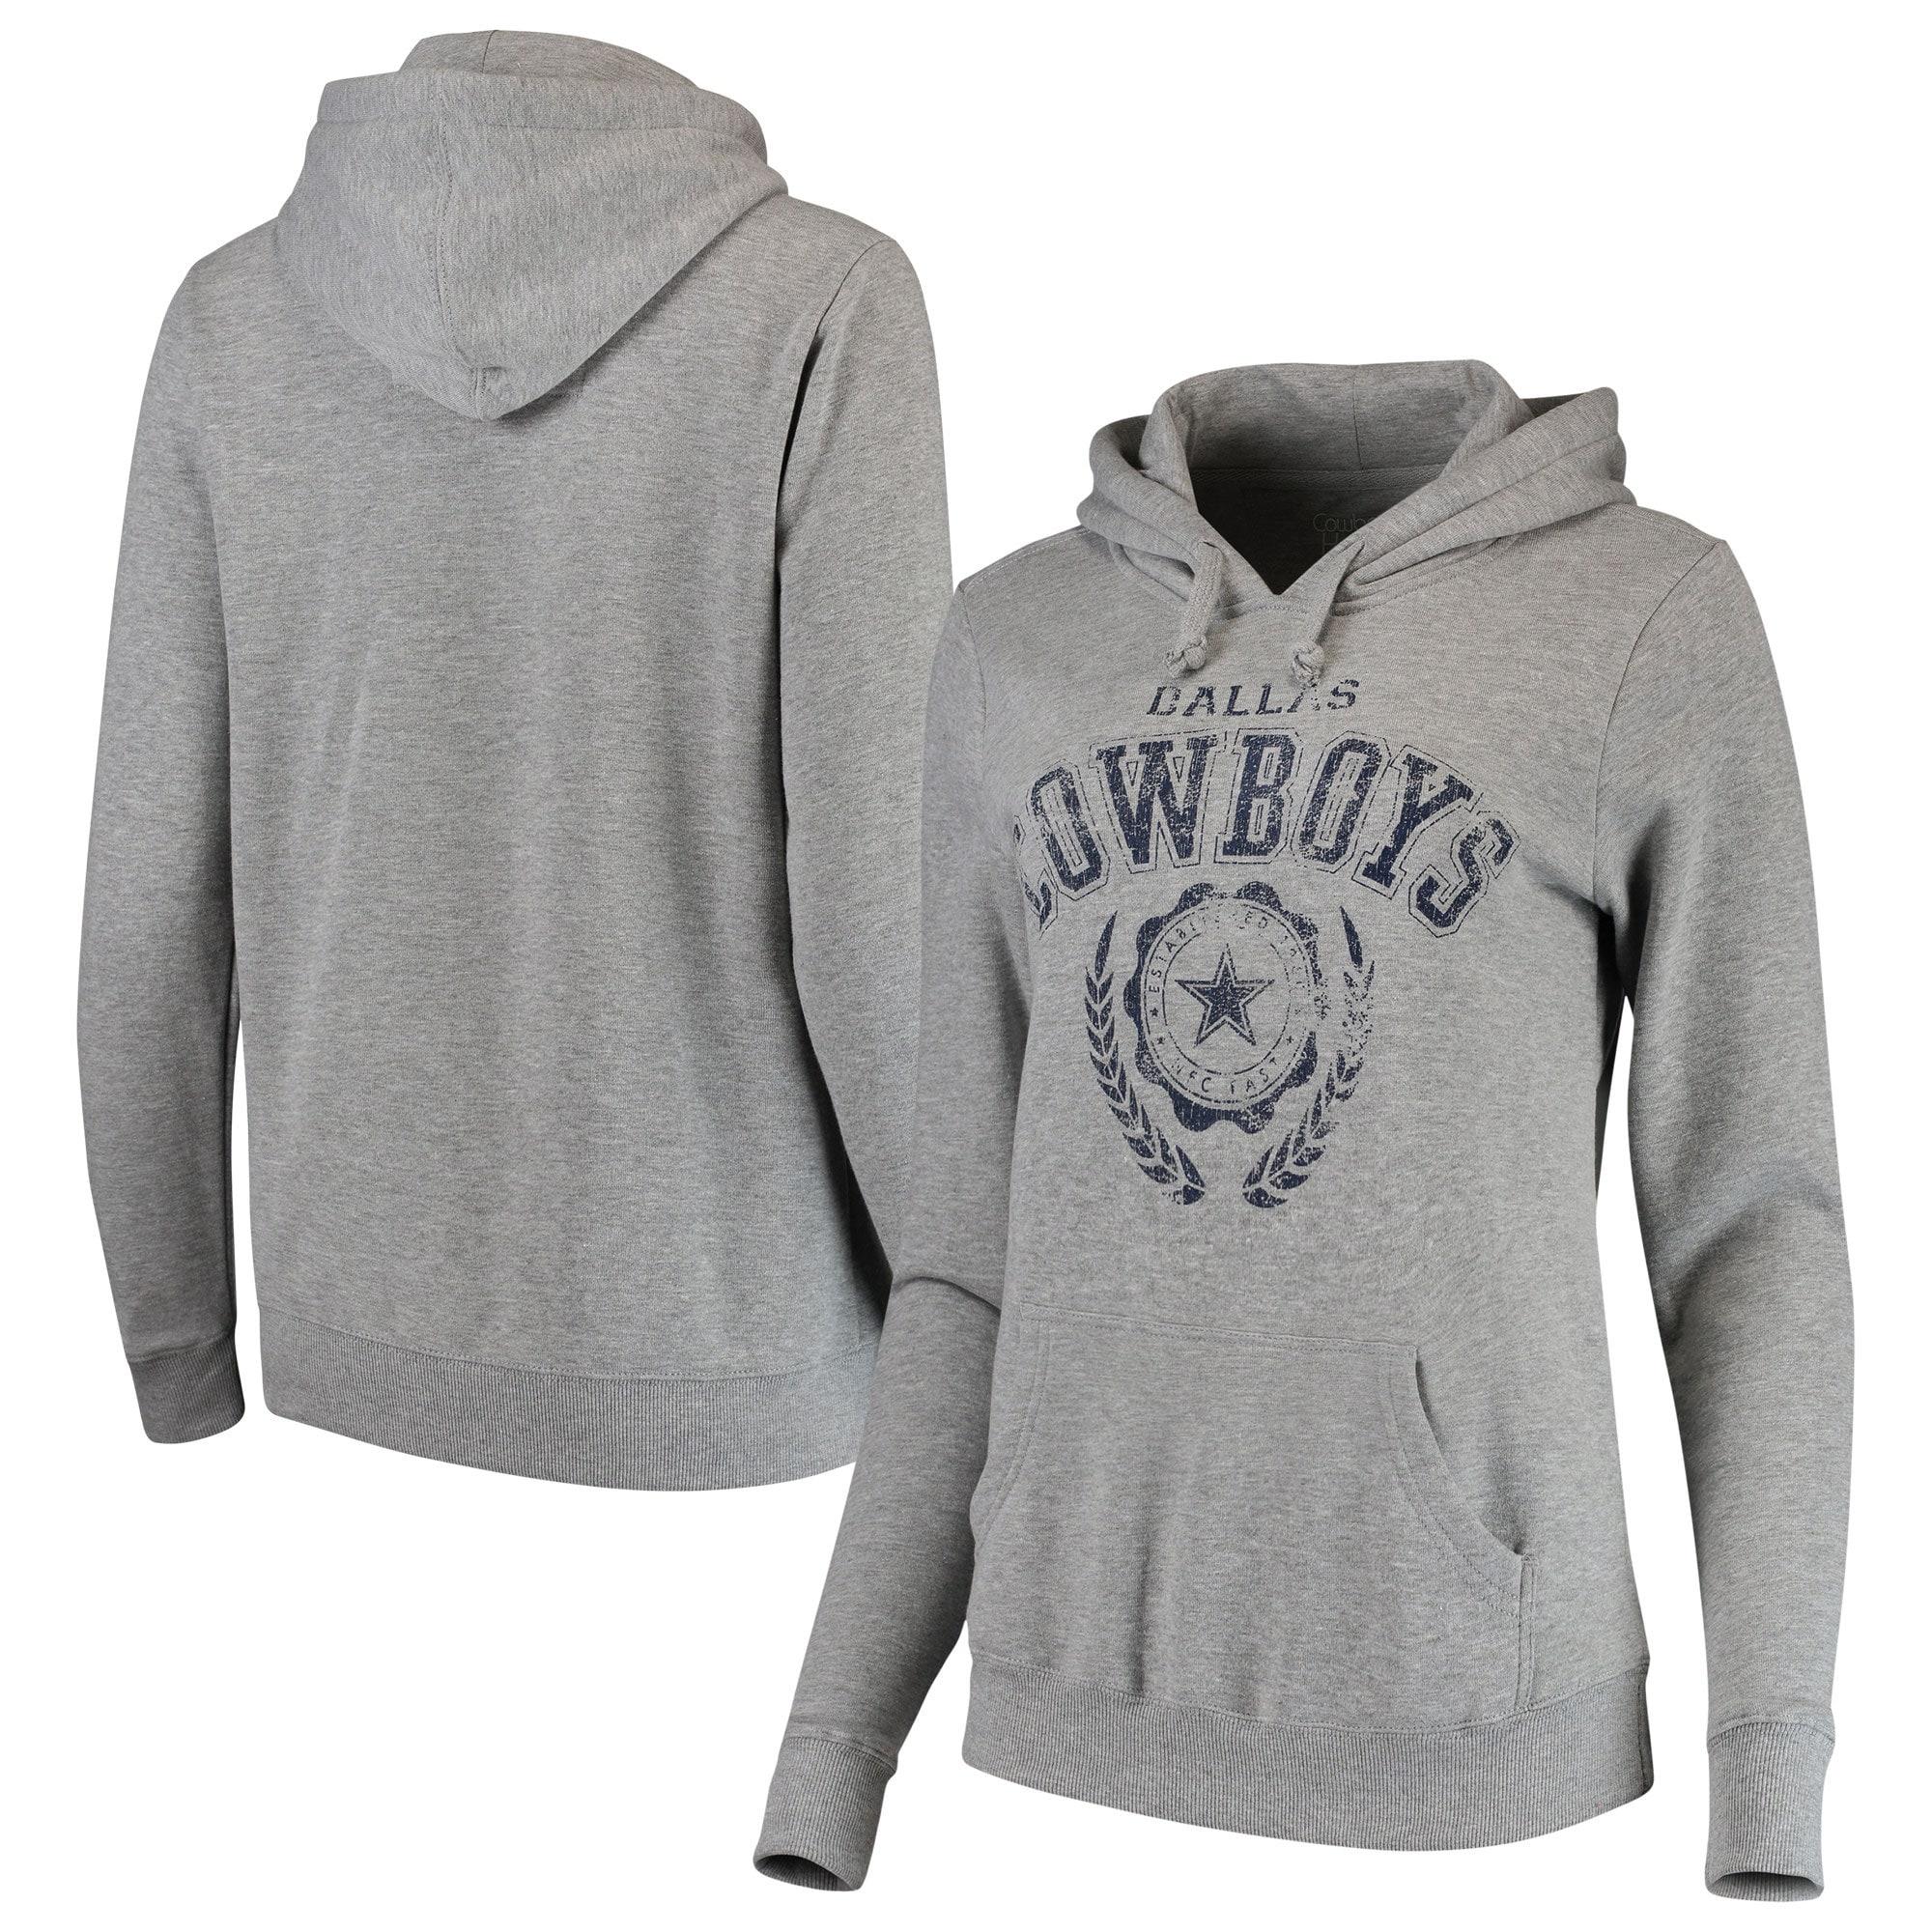 Dallas Cowboys Women's Whelp Pullover Hoodie - Gray